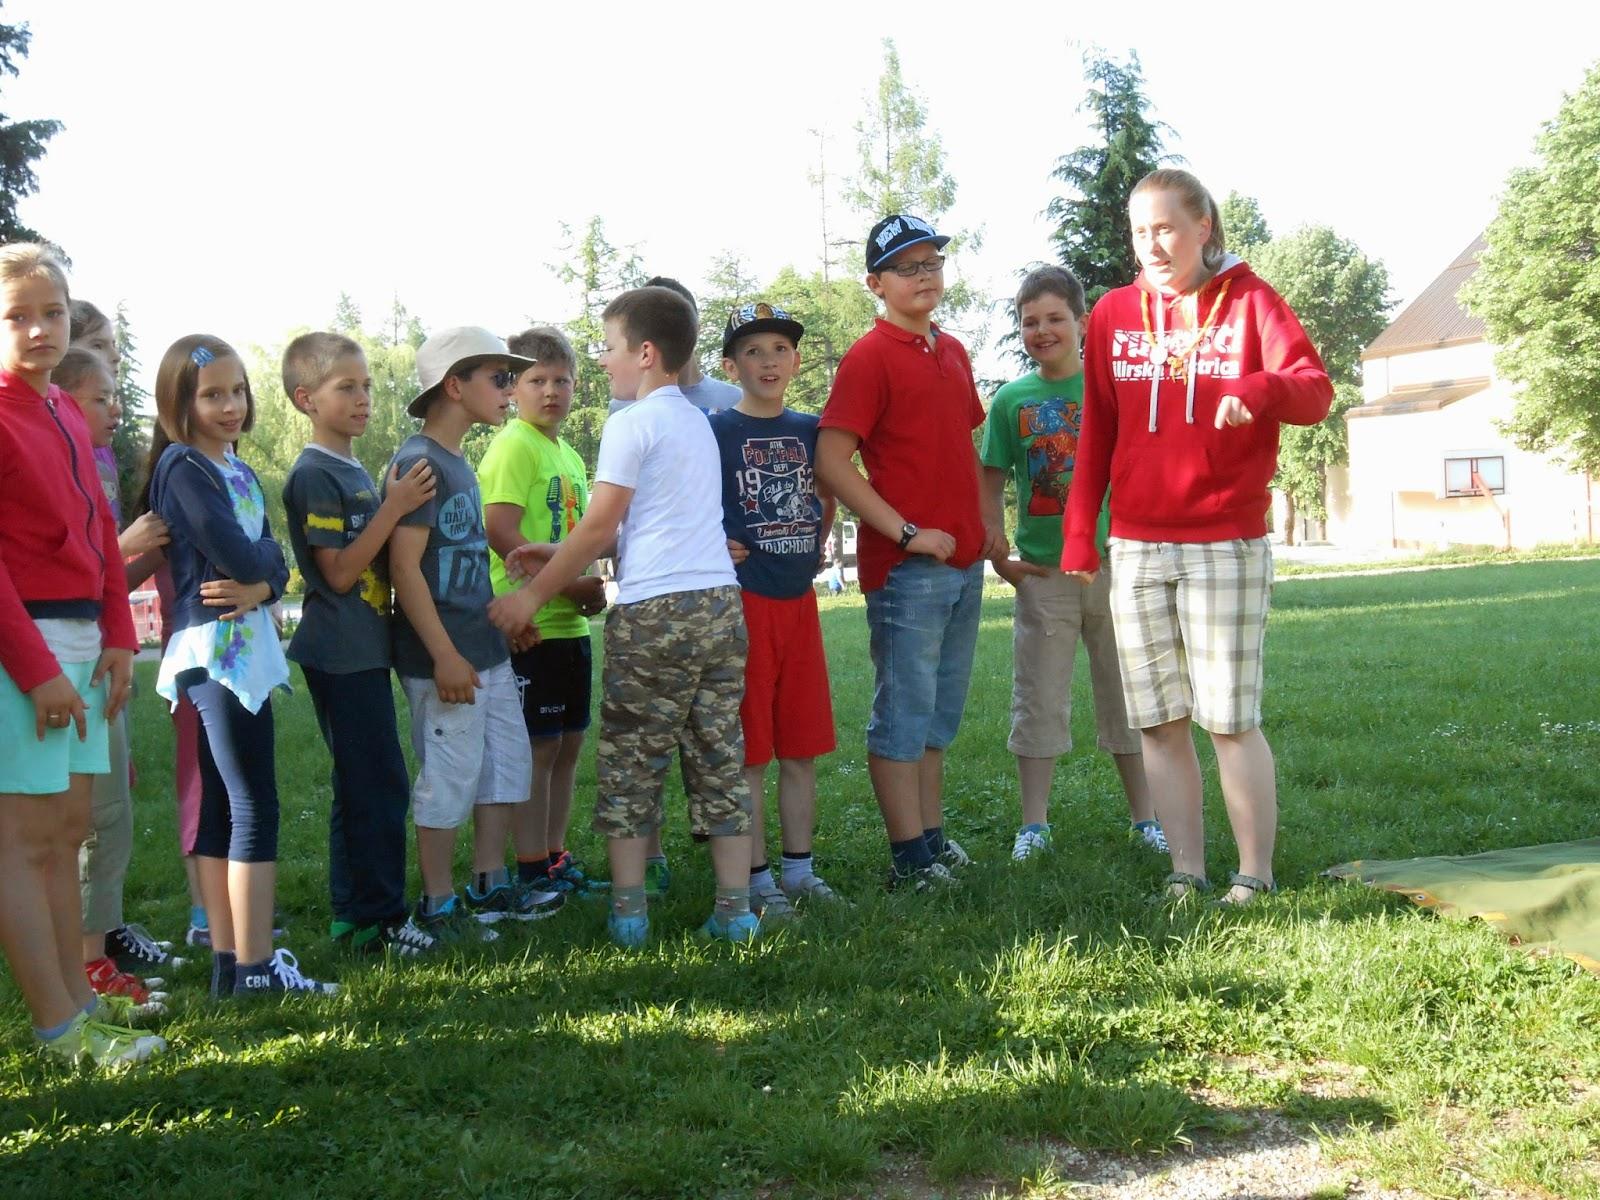 Športni dan 4. a in 4. b, Ilirska Bistrica, 19. 5. 2015 - DSCN4622.JPG